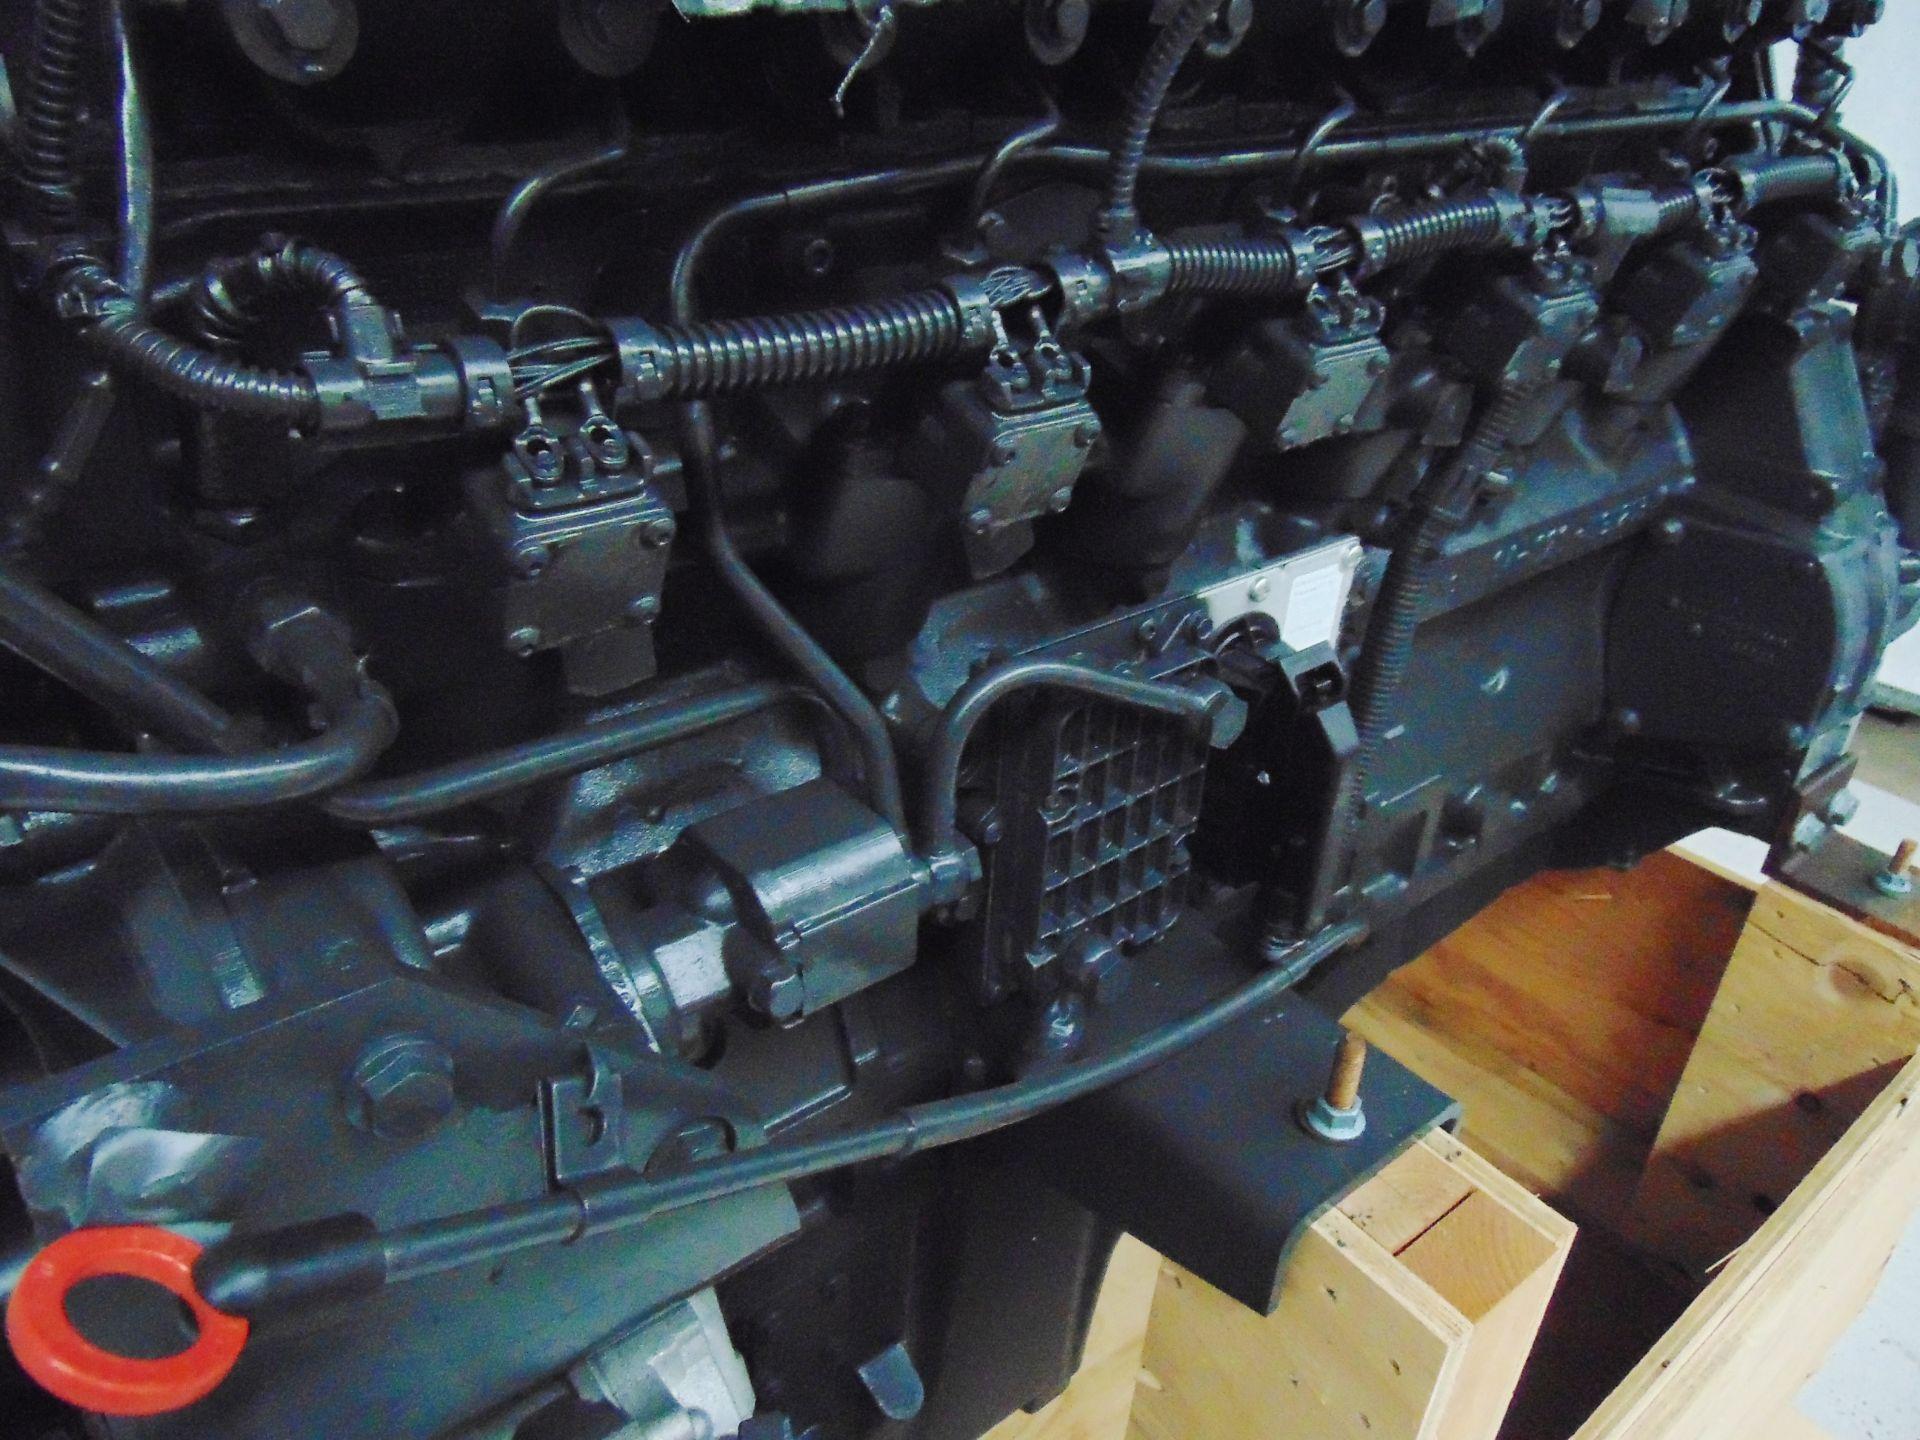 Lot 16 - Brand New & Unused Mercedes-Benz OM457LA Turbo Diesel Engine